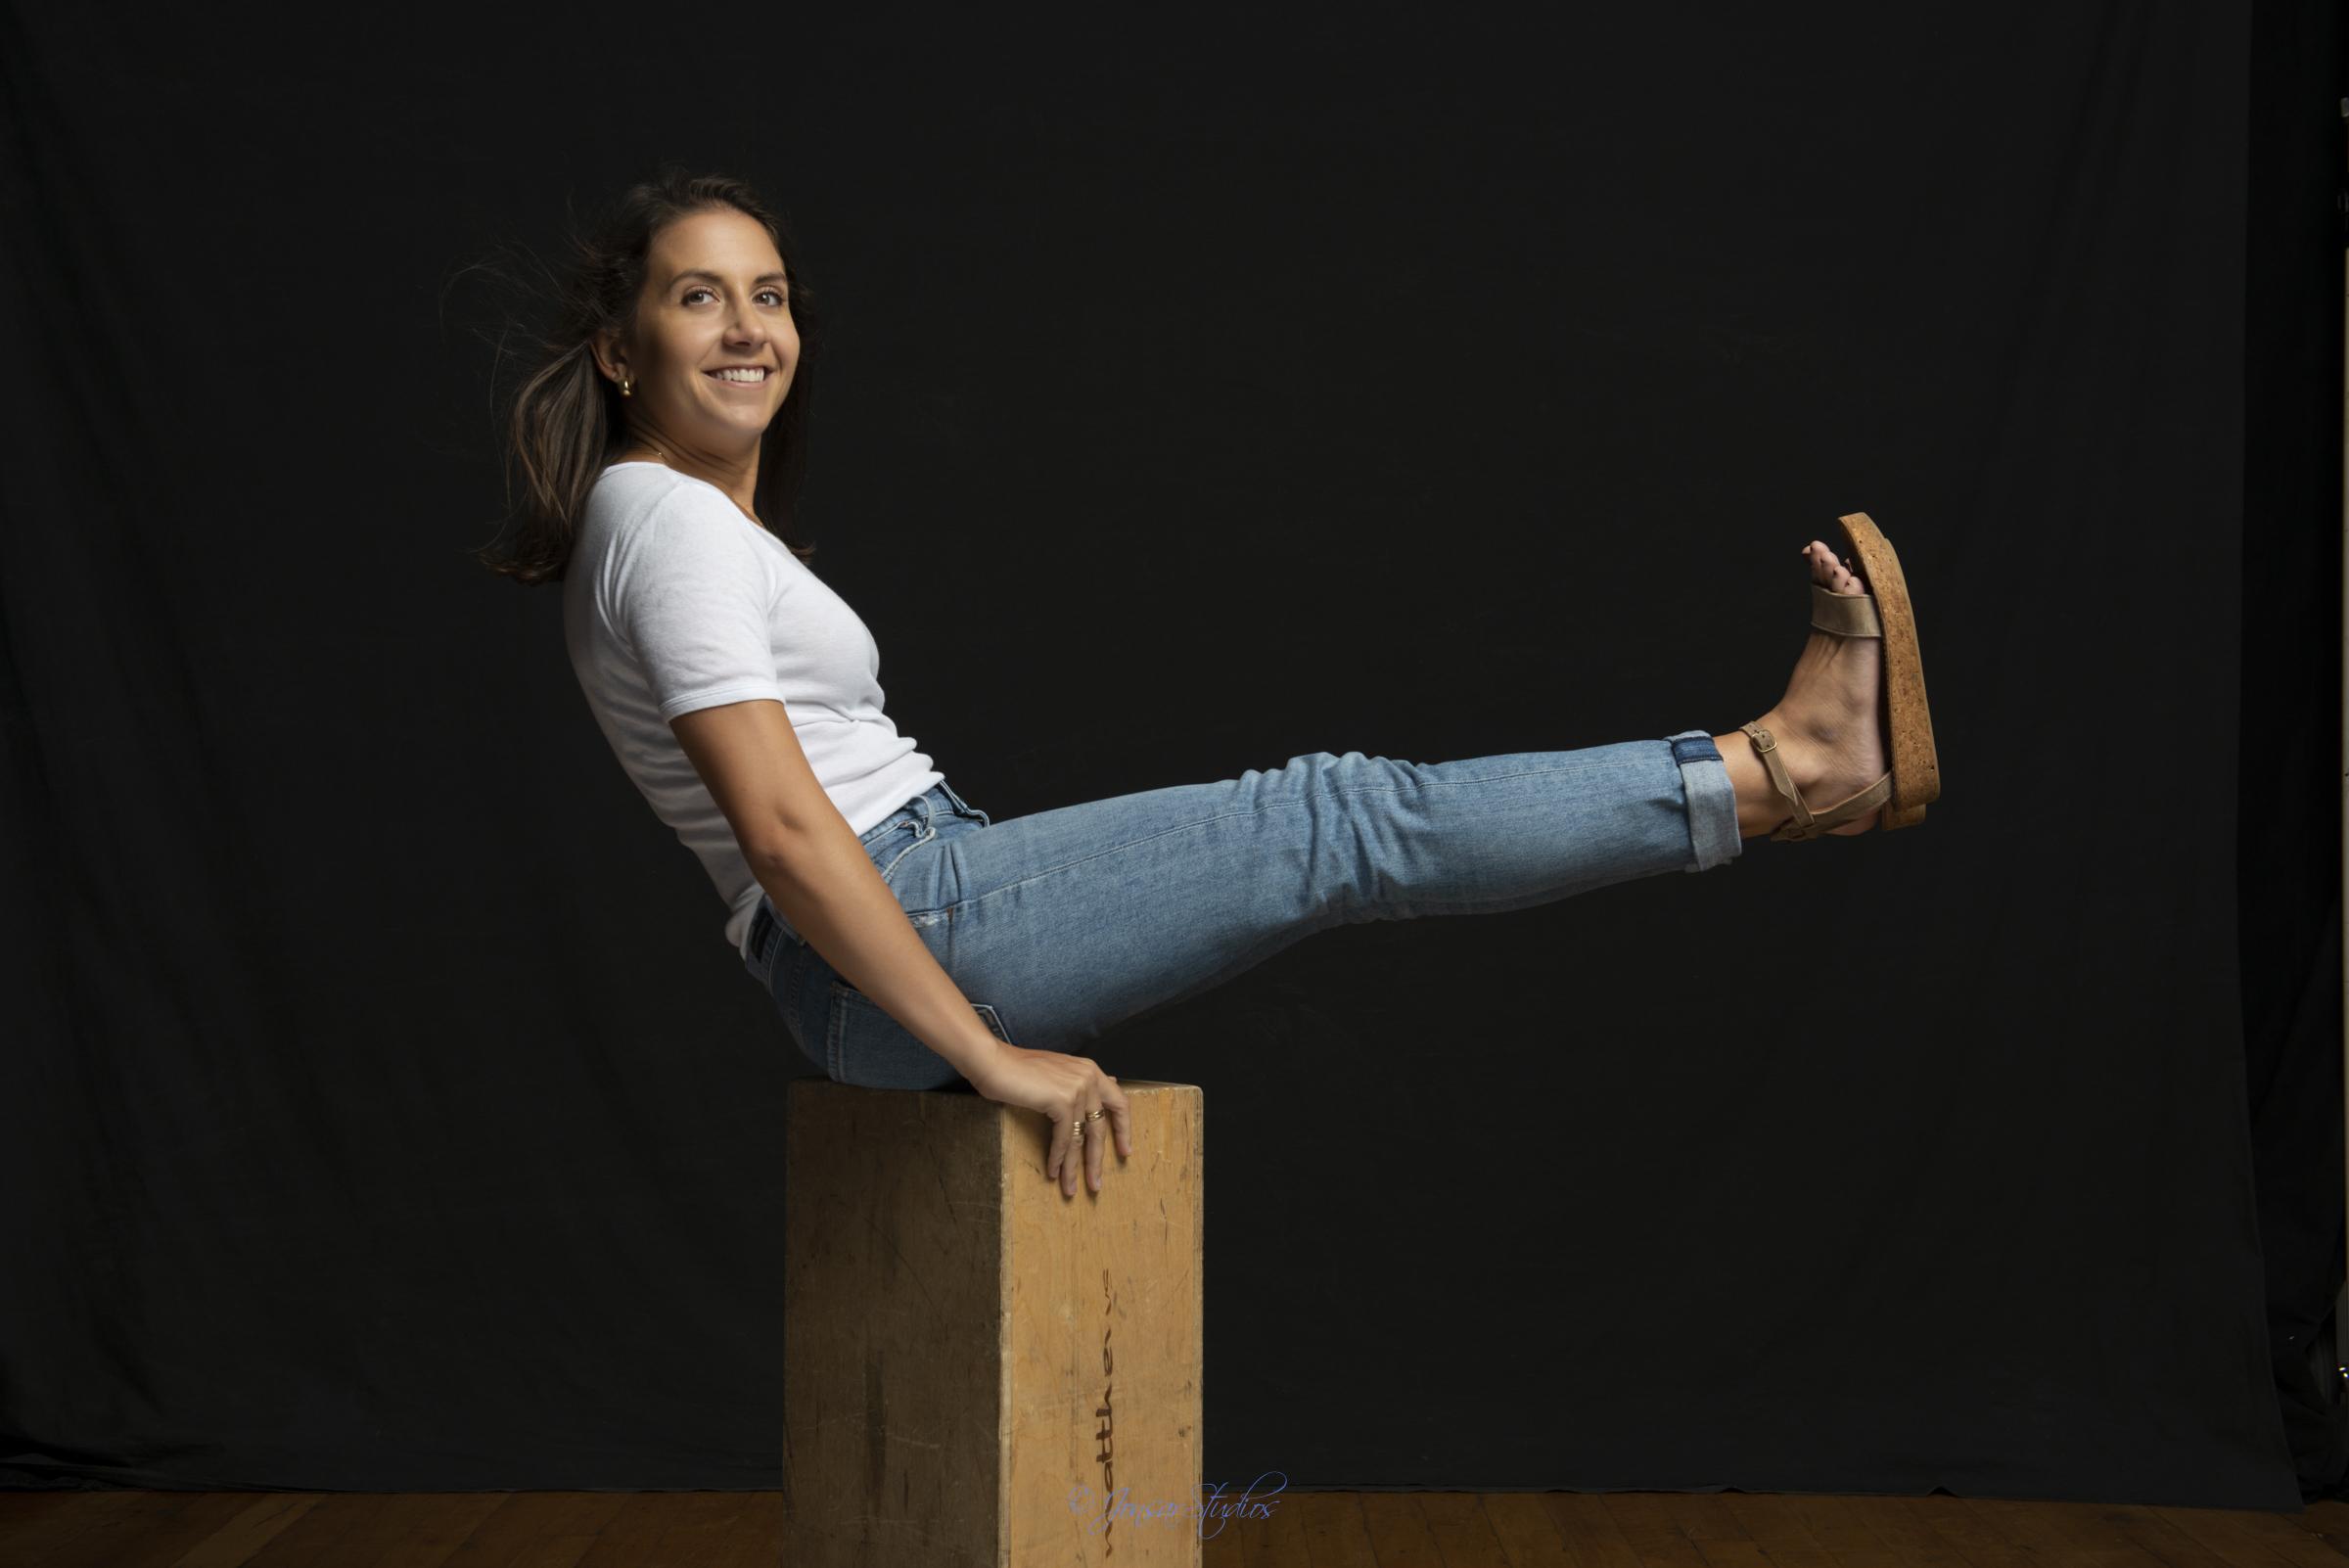 Color studio portrait of woman in jeans on apple box on black backdrop